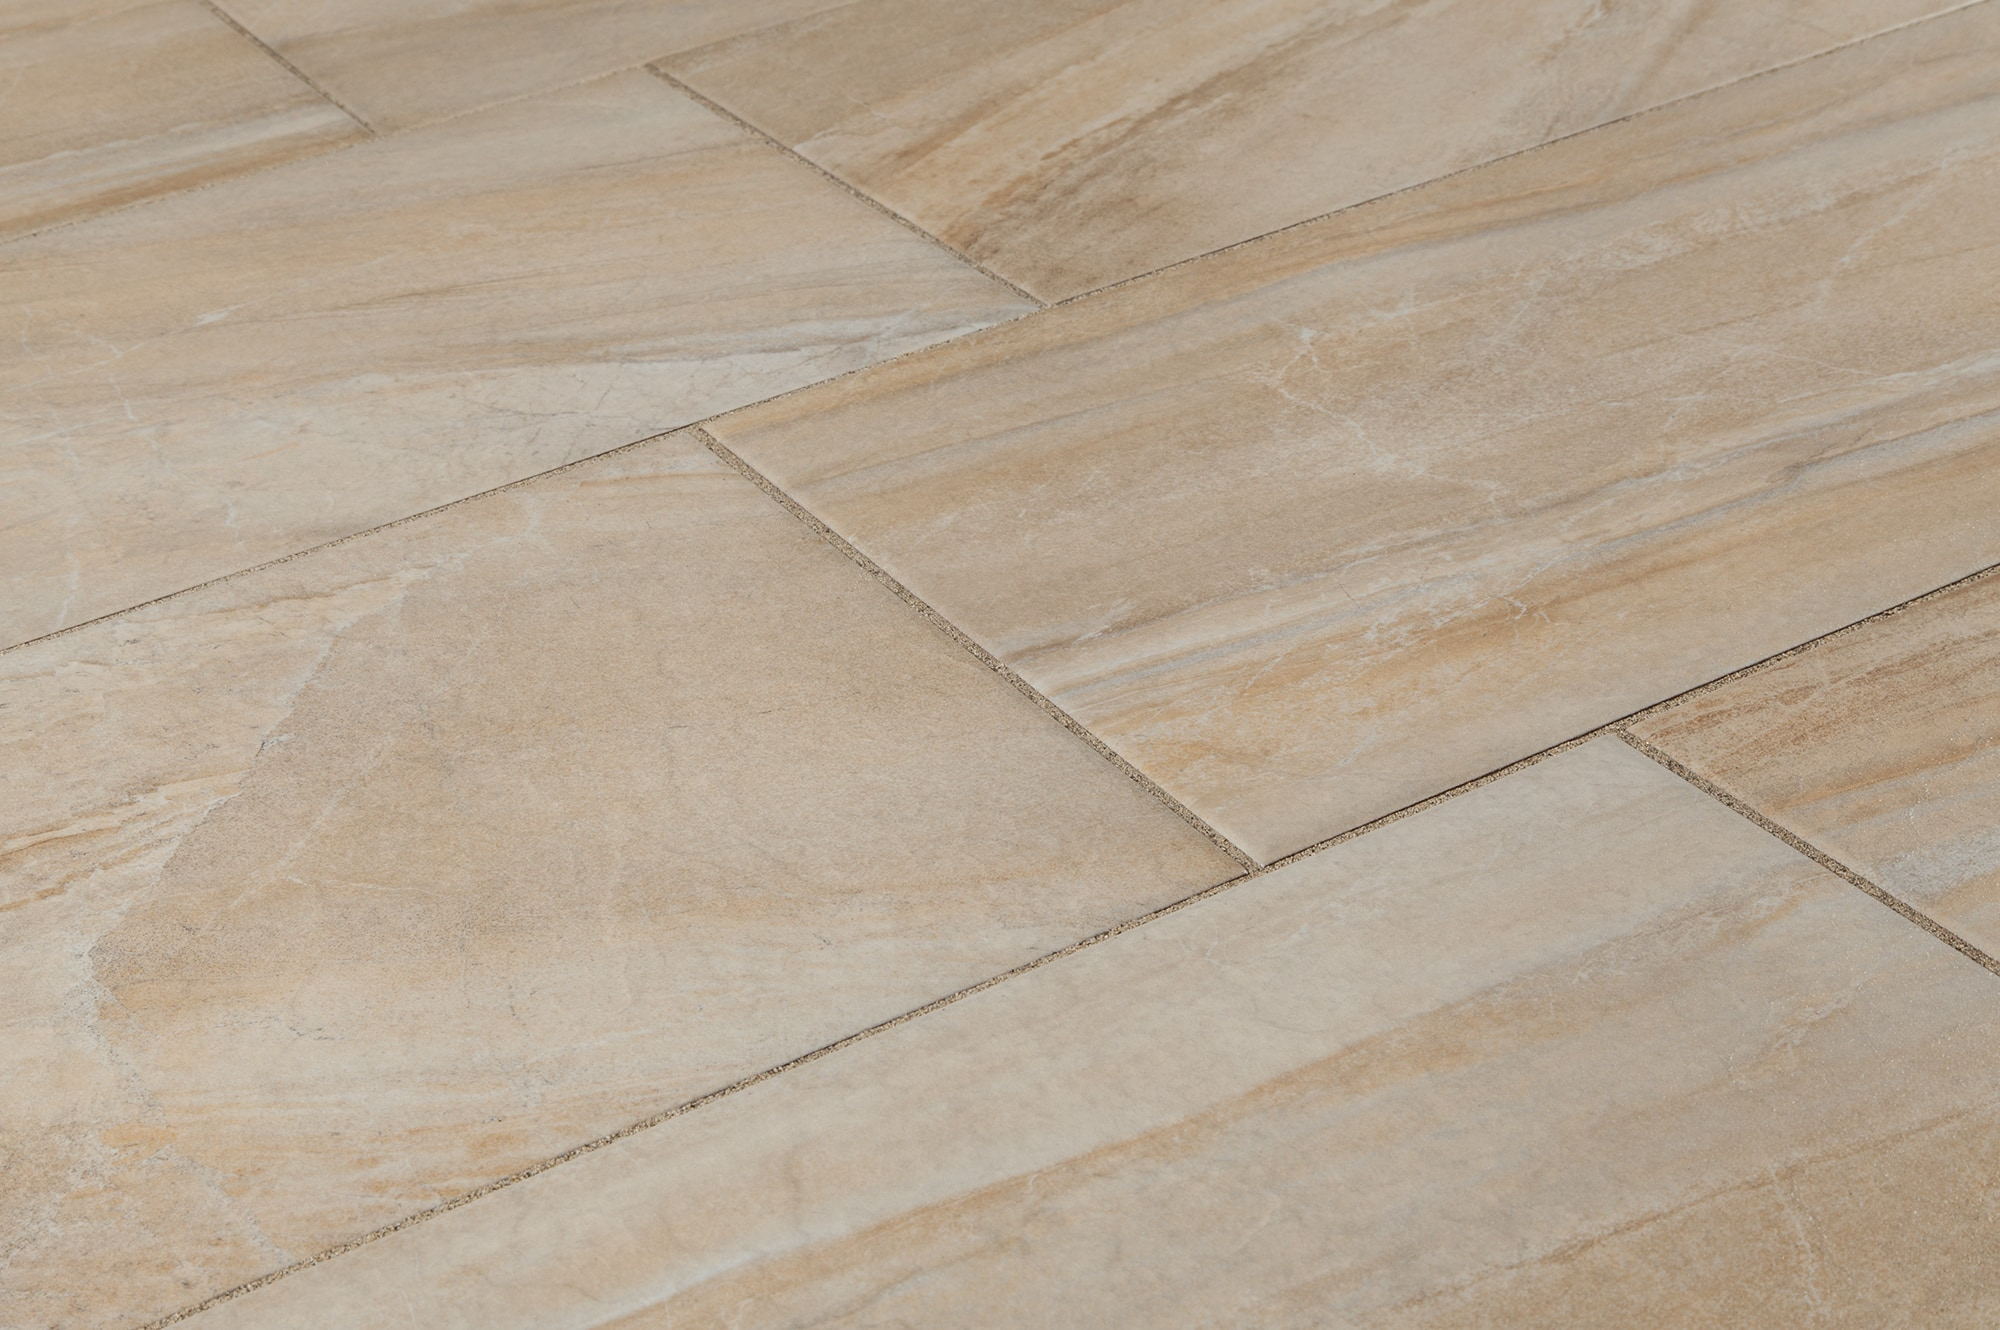 Kaska italian porcelain tile florence series bone 12 x24 Tile ceramic flooring